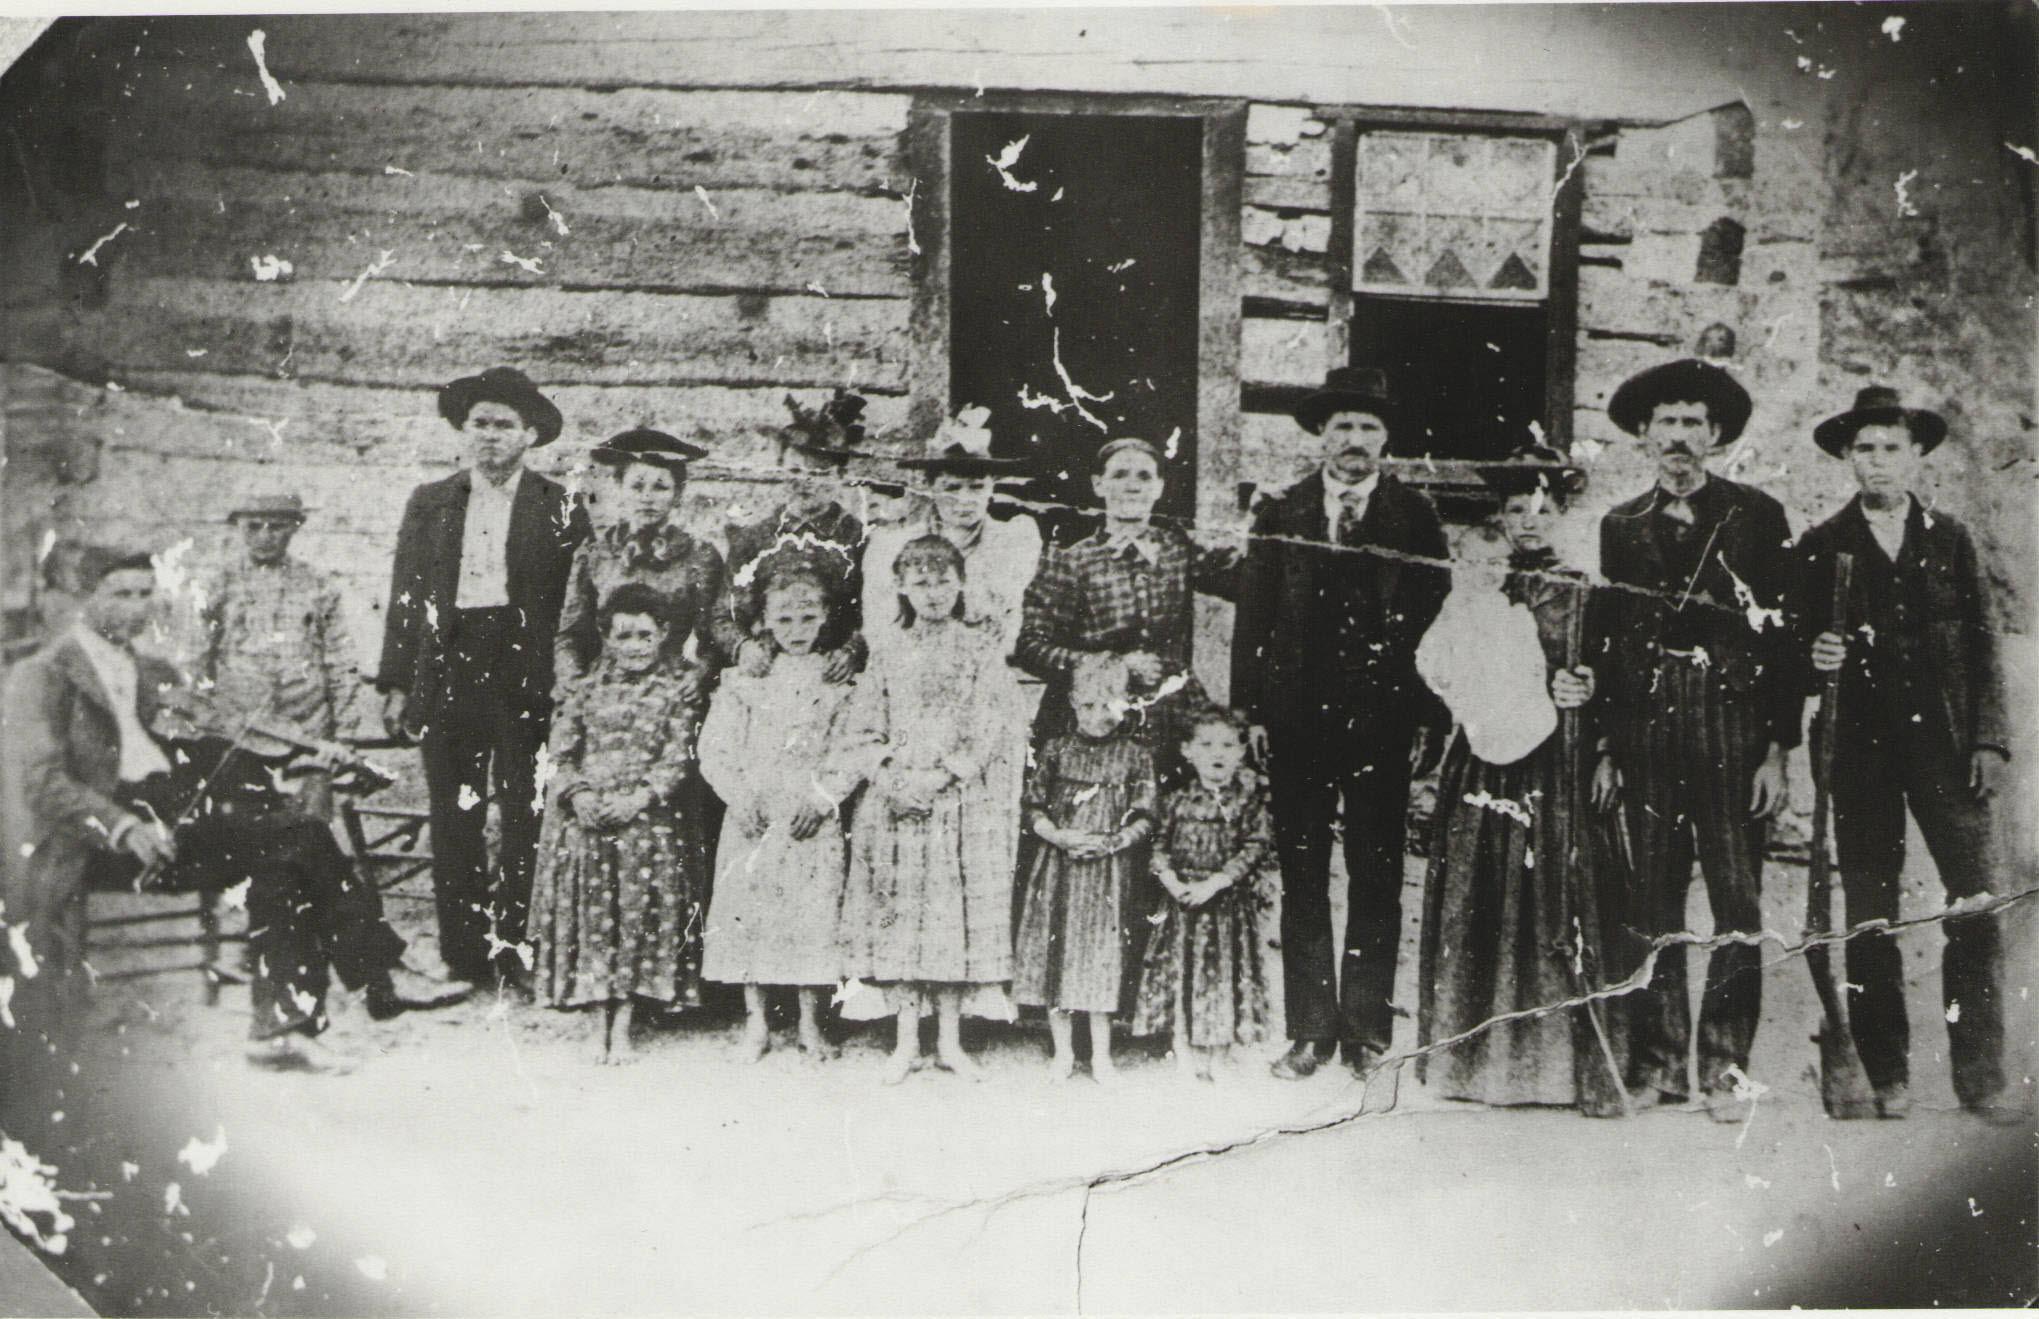 Peggy John Harrod family, Bald Knob, Franklin Co., KY, 1892. Lee Harrod with fiddle.